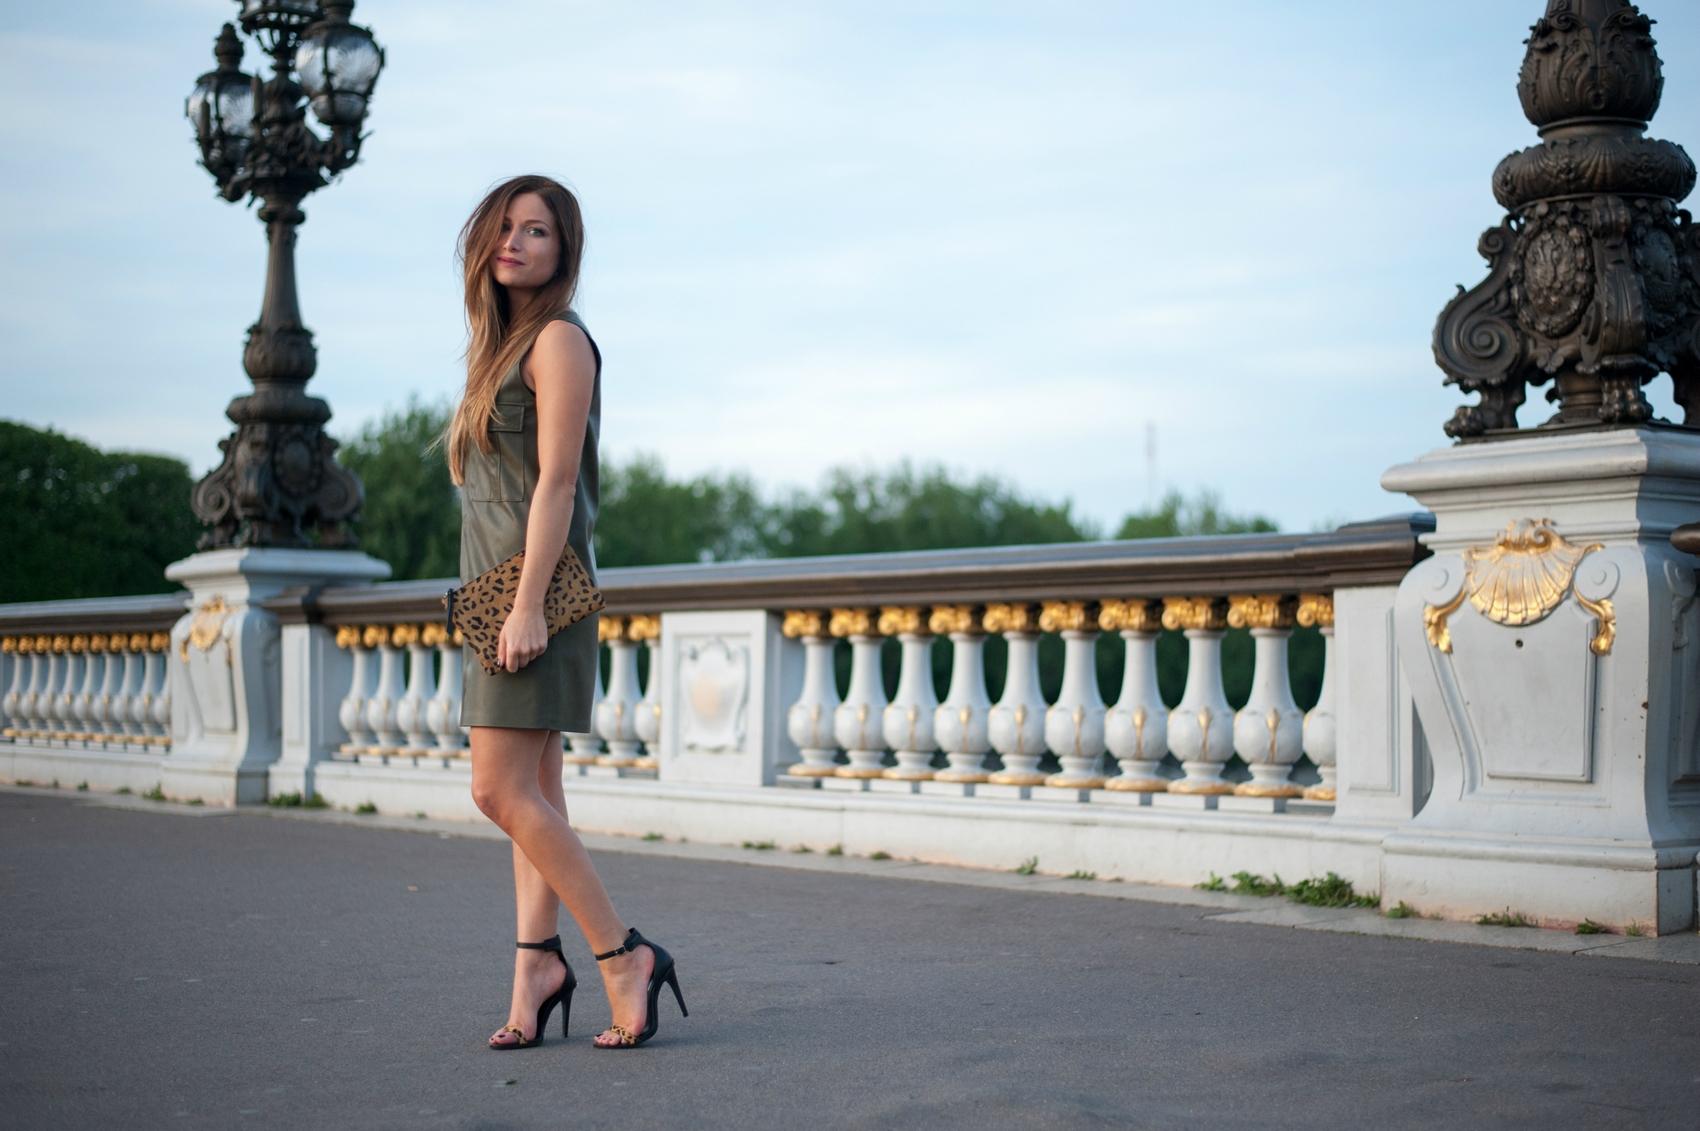 khaki leather dress and high heels